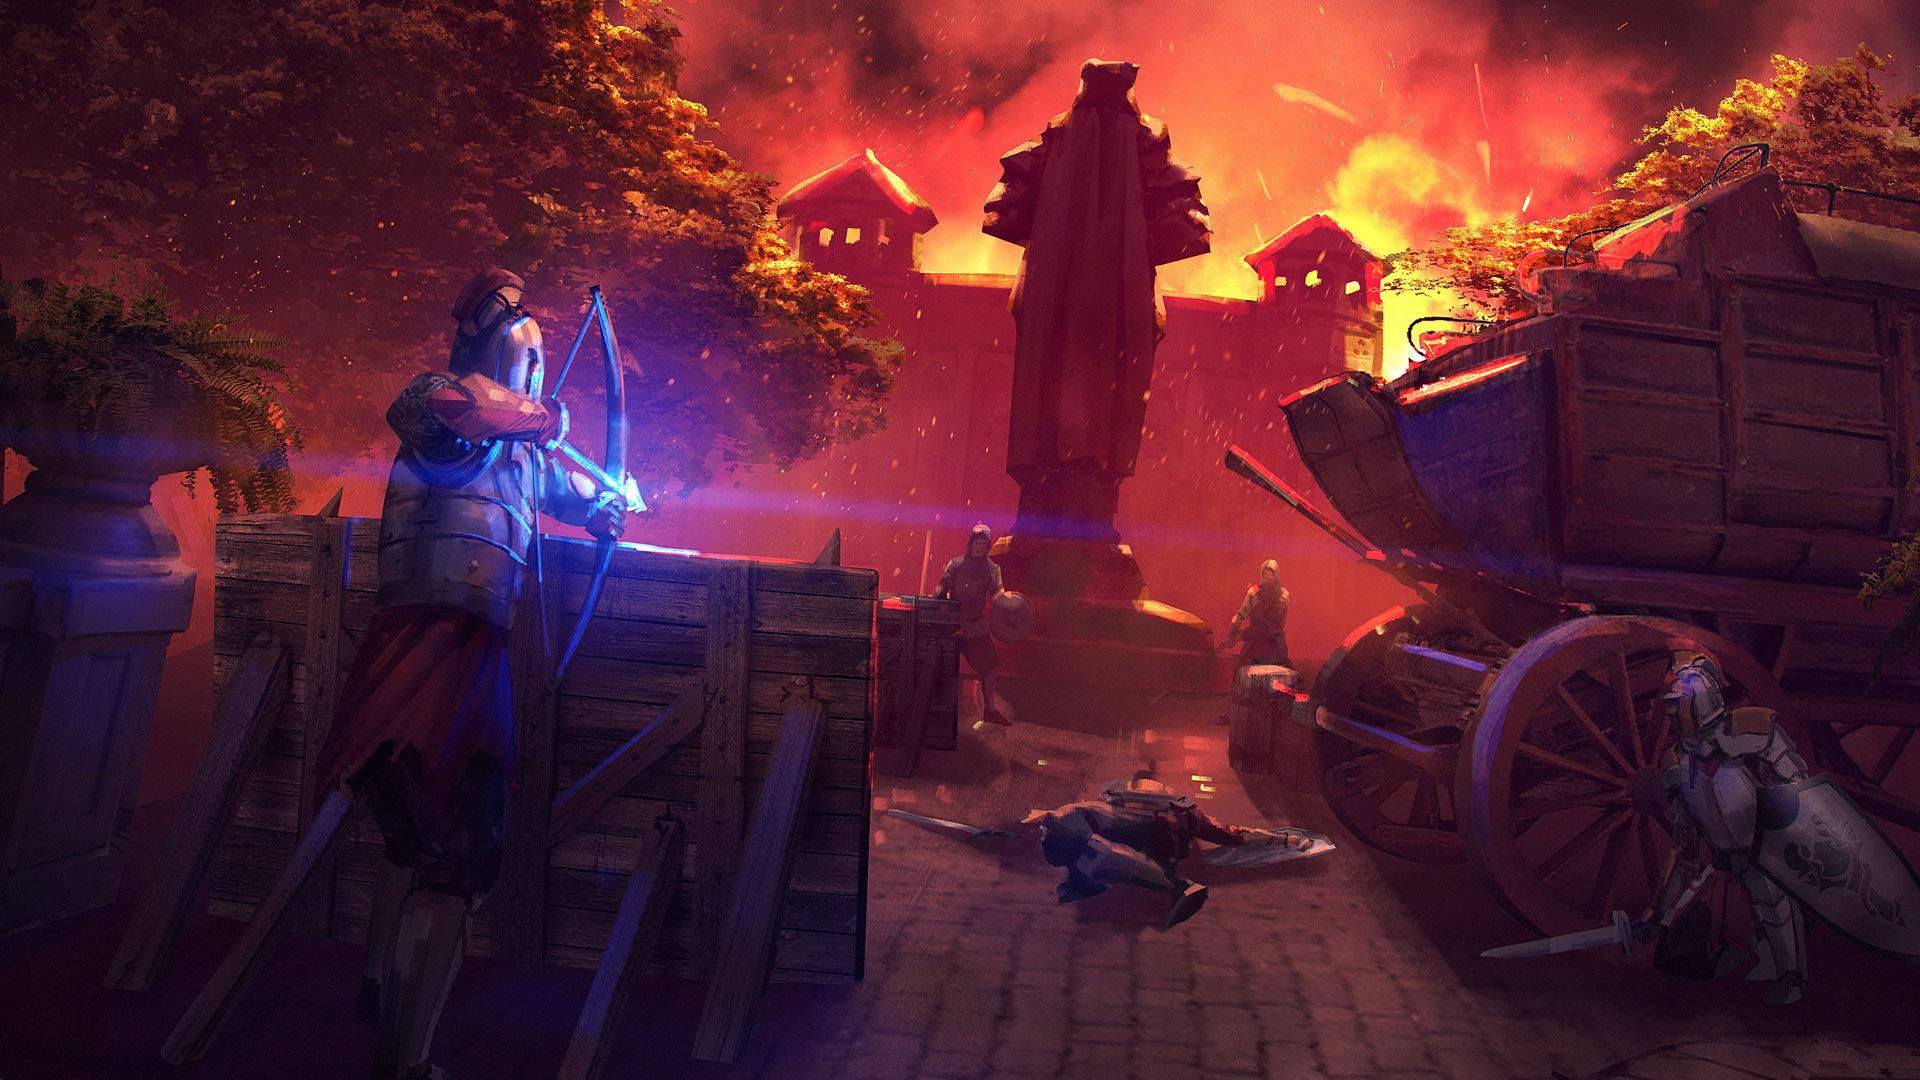 Forged of Blood concept art environment prologue courtyard battle